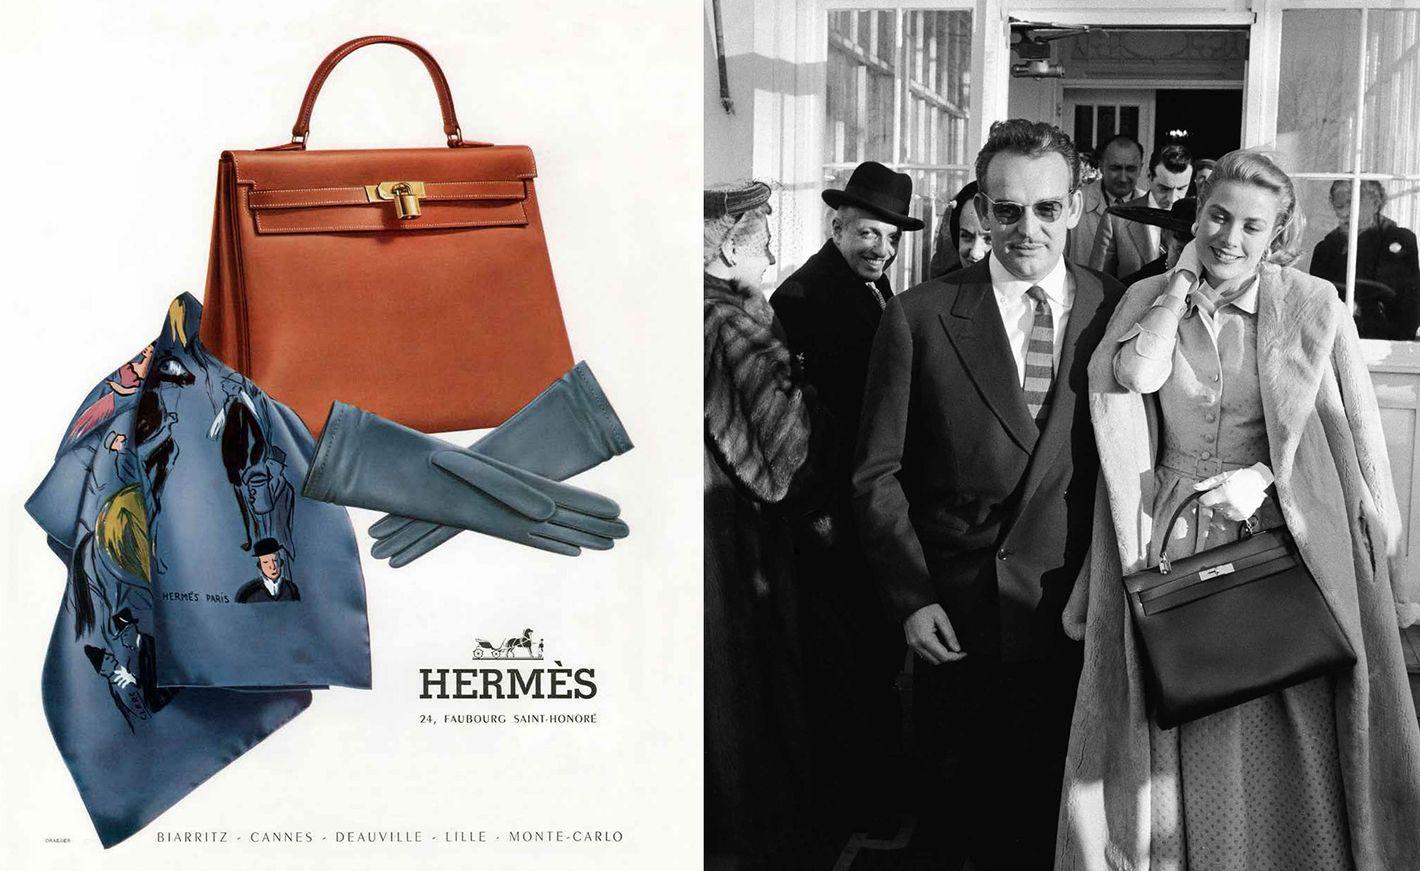 21 with questions handbag designer monica botkier